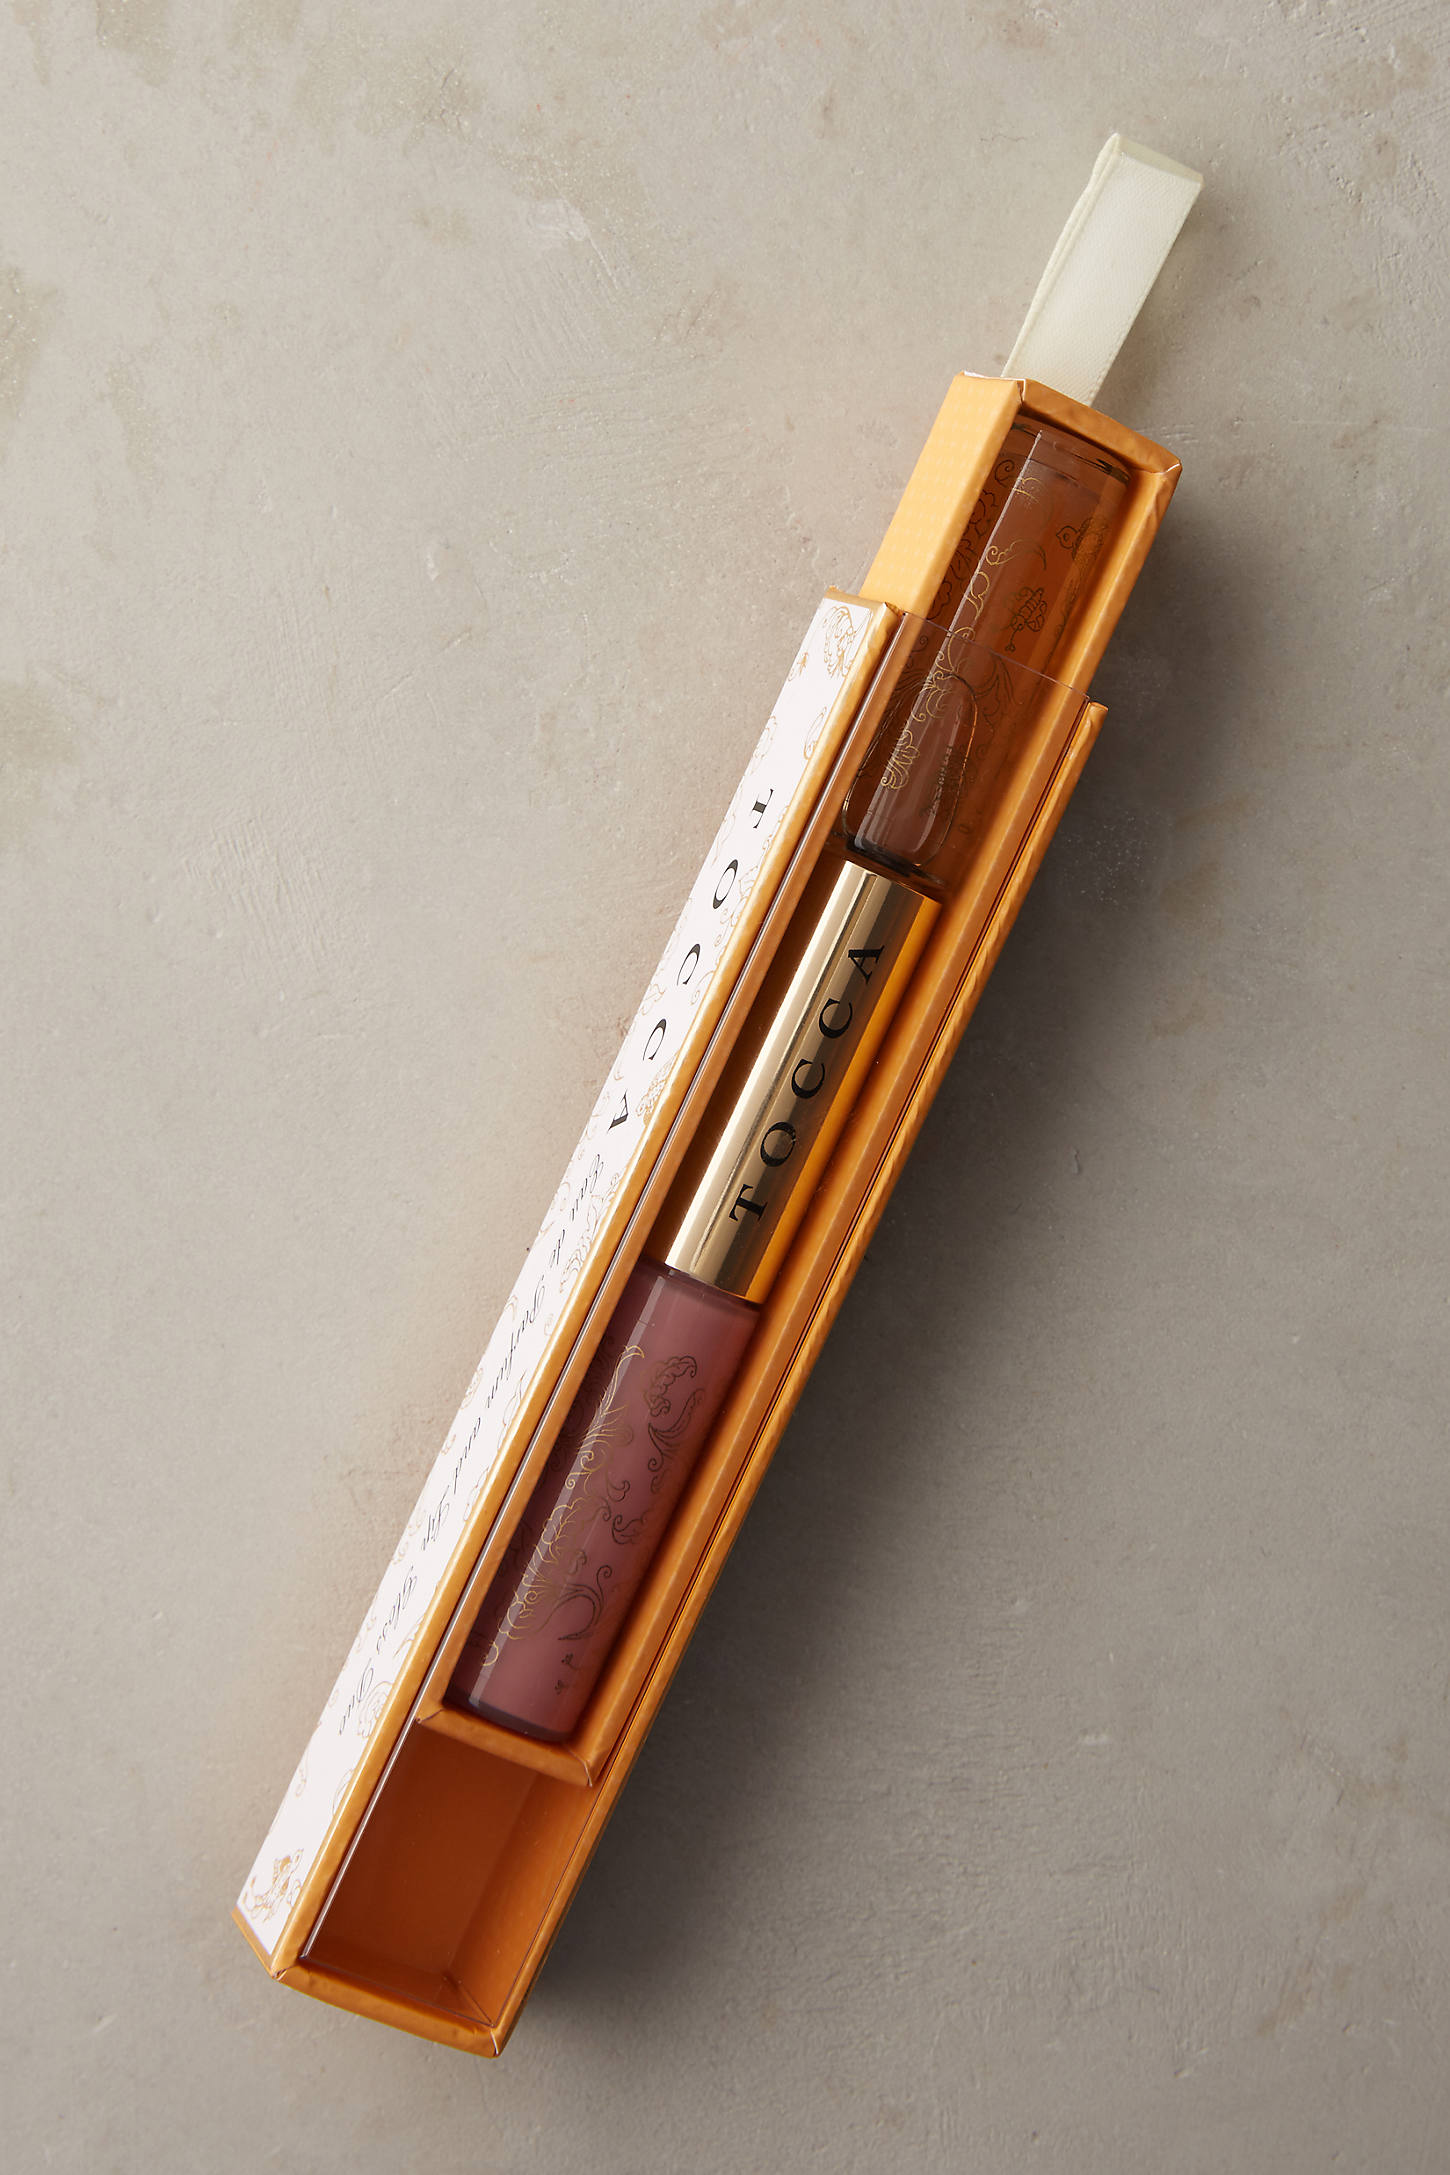 Tocca Eau de Parfum and Lip Gloss Duo